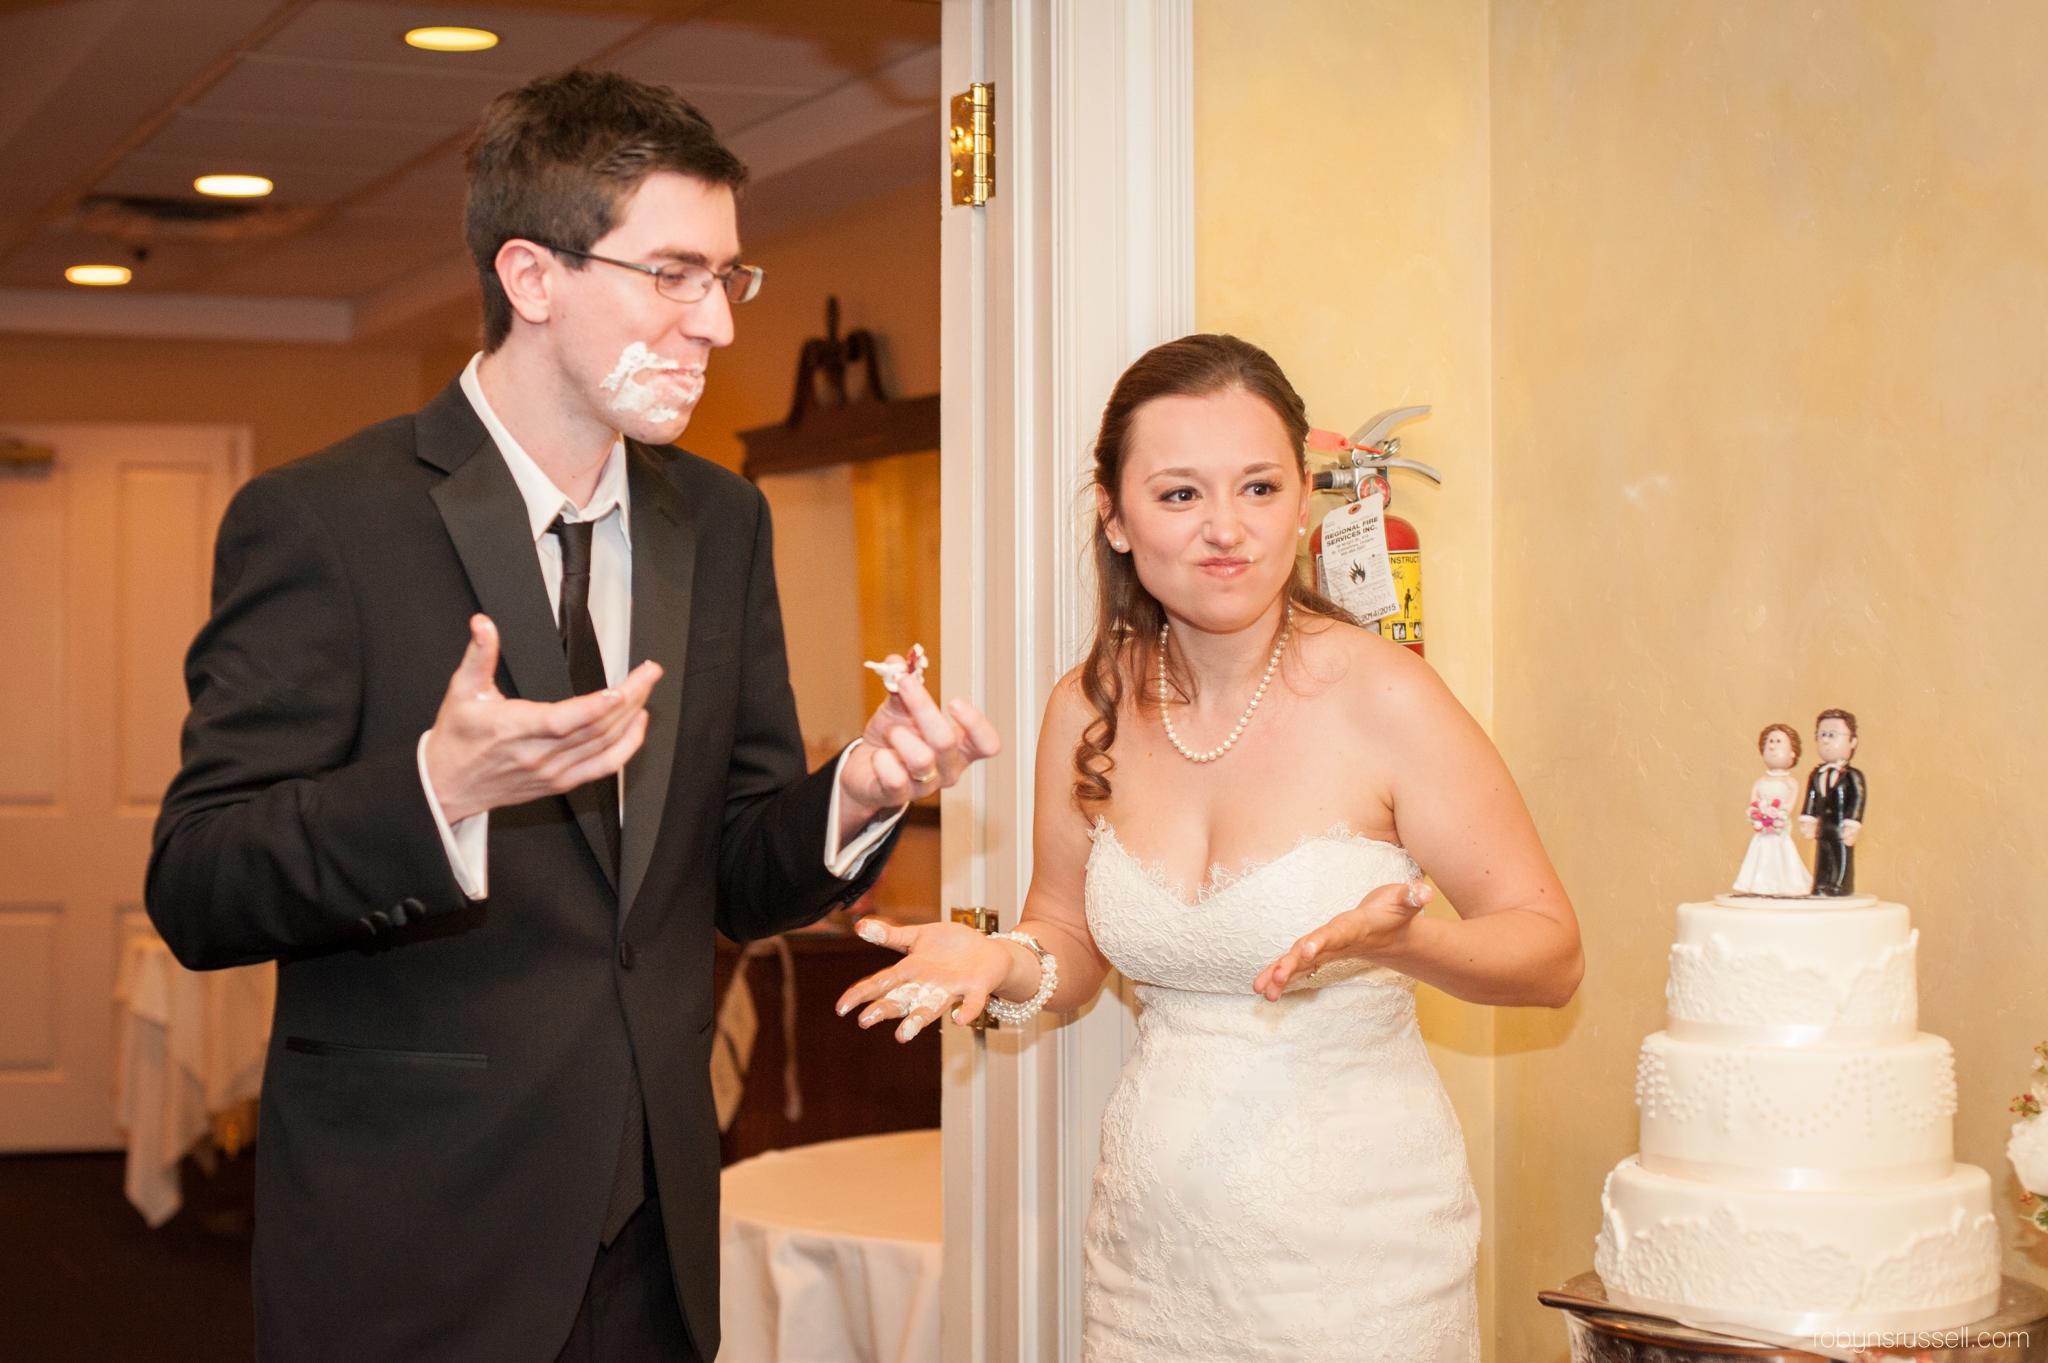 41-bride-and-groom-cut-the-cake-at-inn-on-the-twenty.jpg